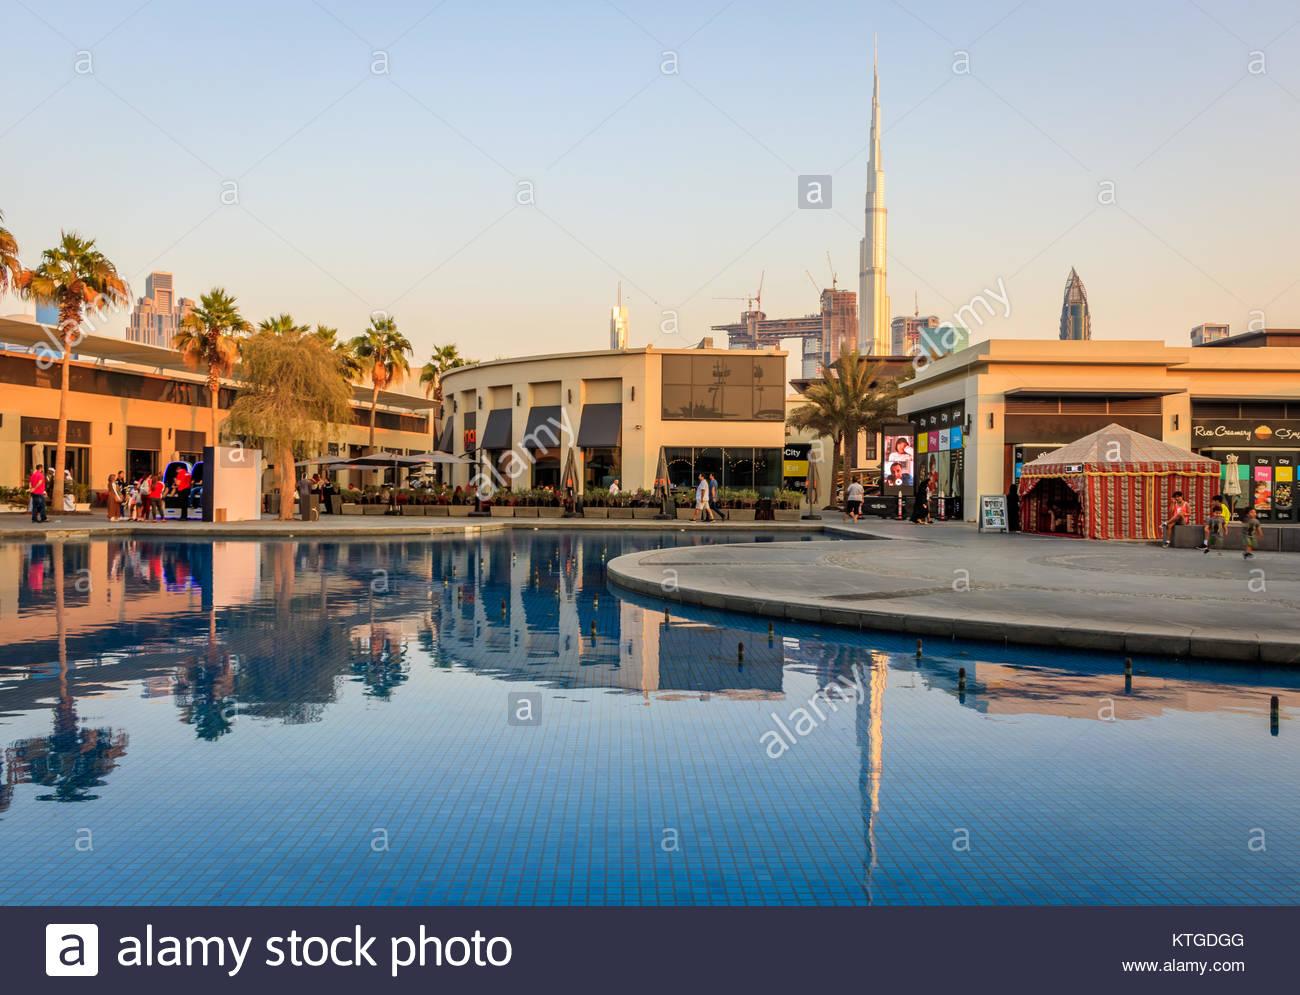 View of City Walk Dubai and Burj Khalifa in Old Dubai. Stock Photo